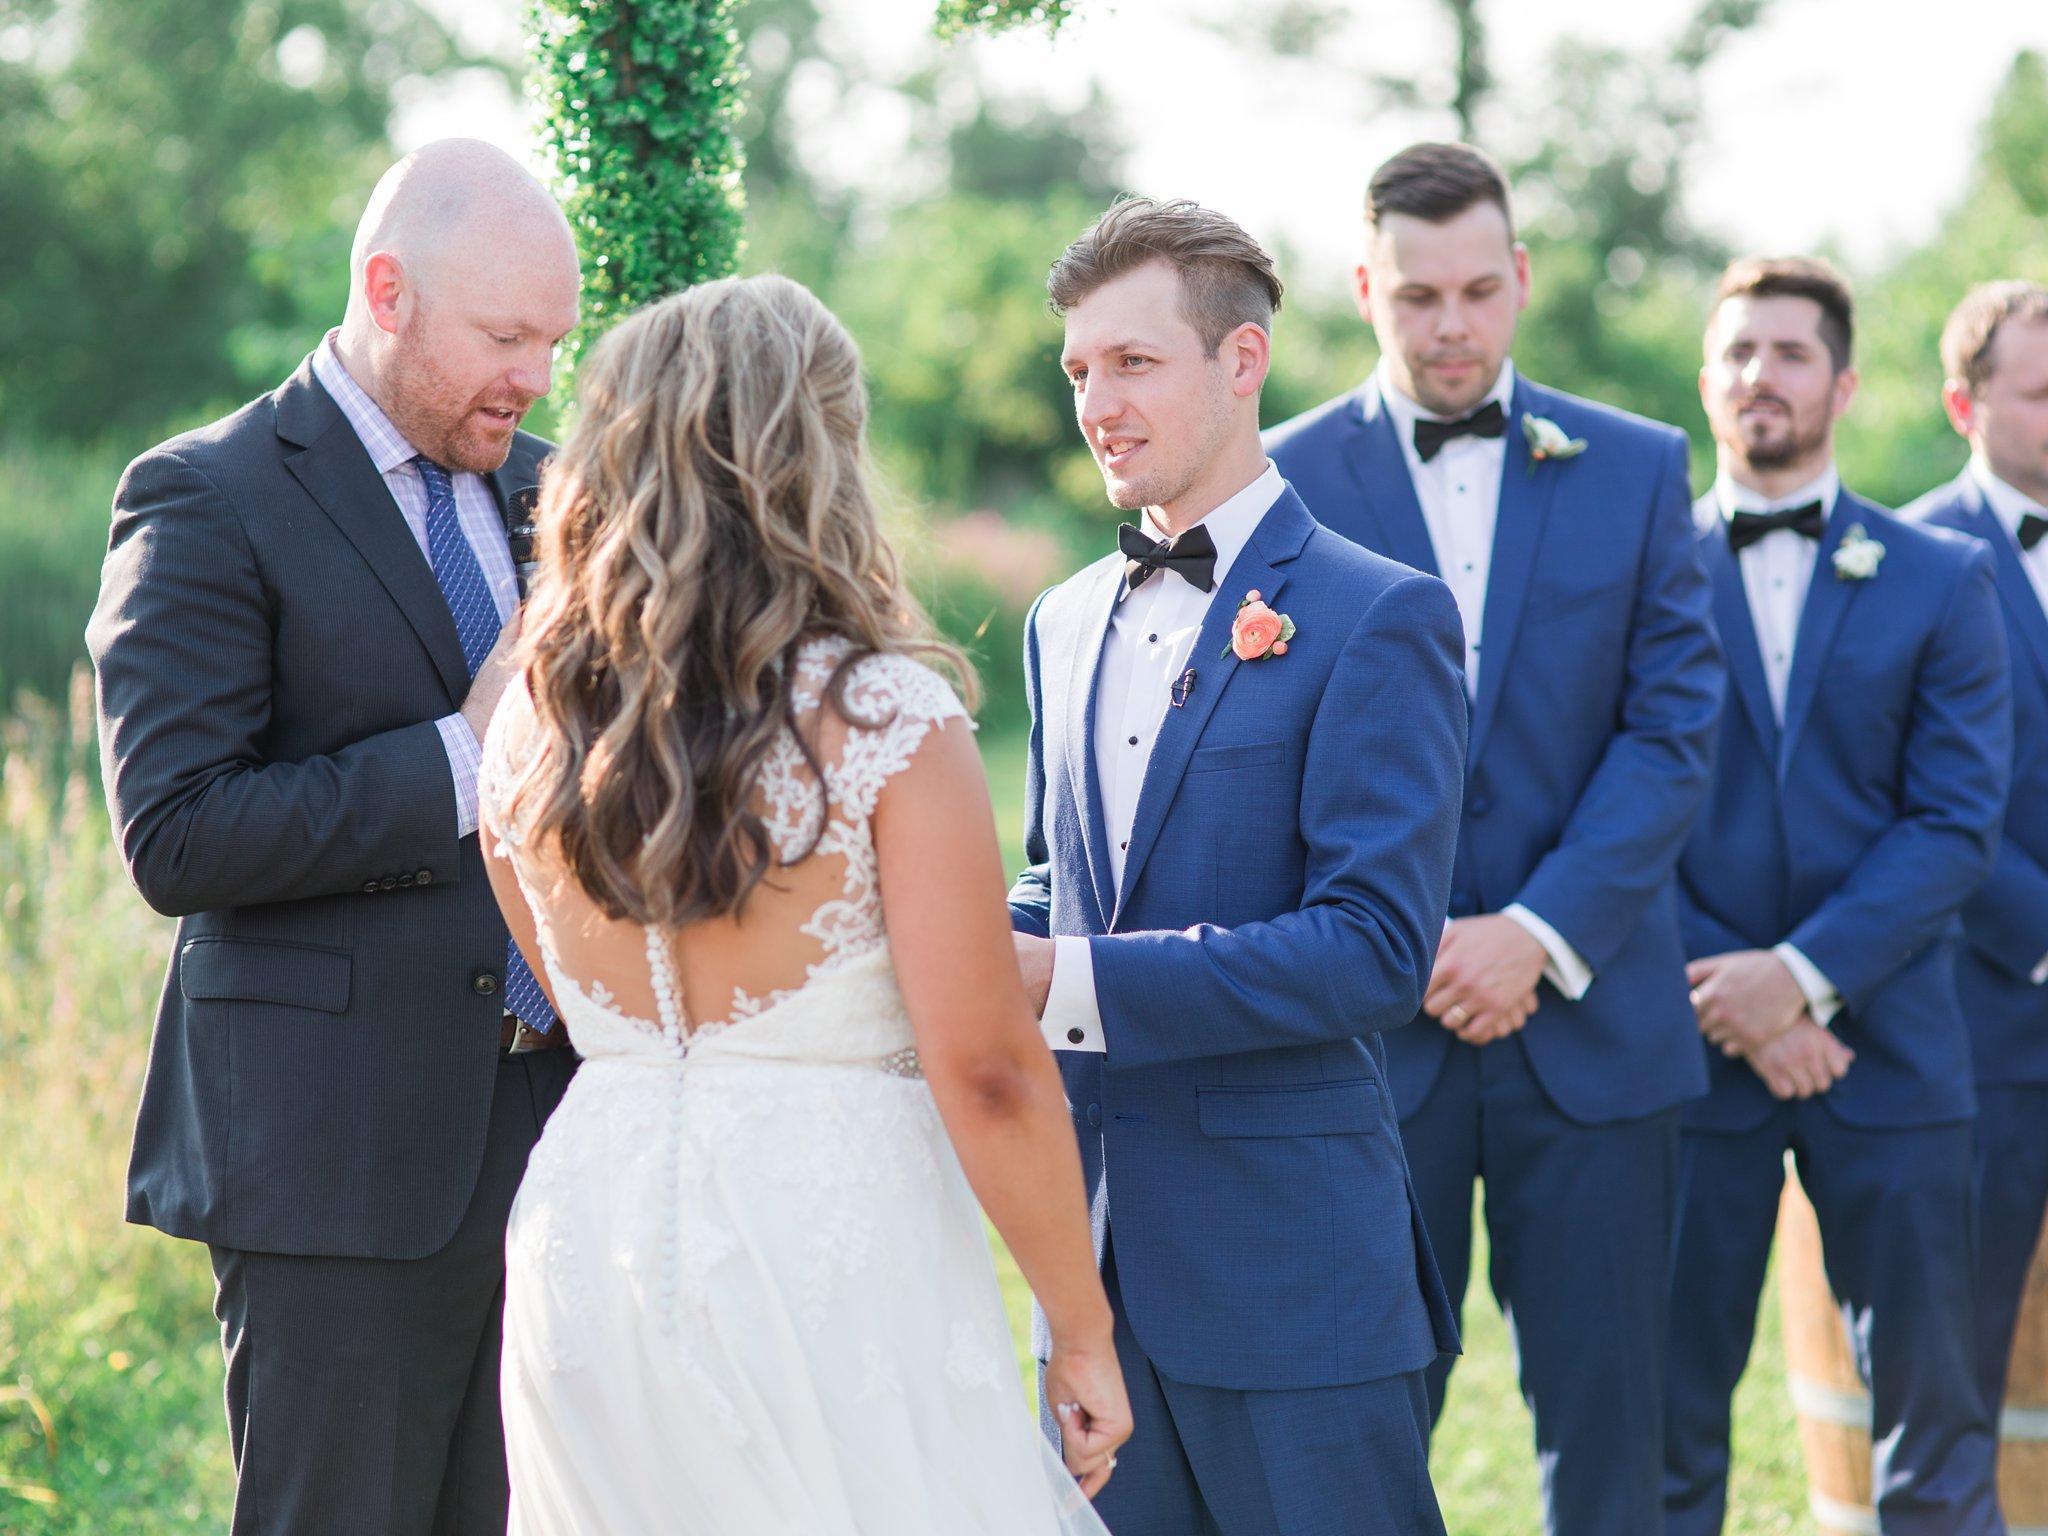 Groomsmen in blue suits Vineyard wedding at Jabulani Amy Pinder Photography